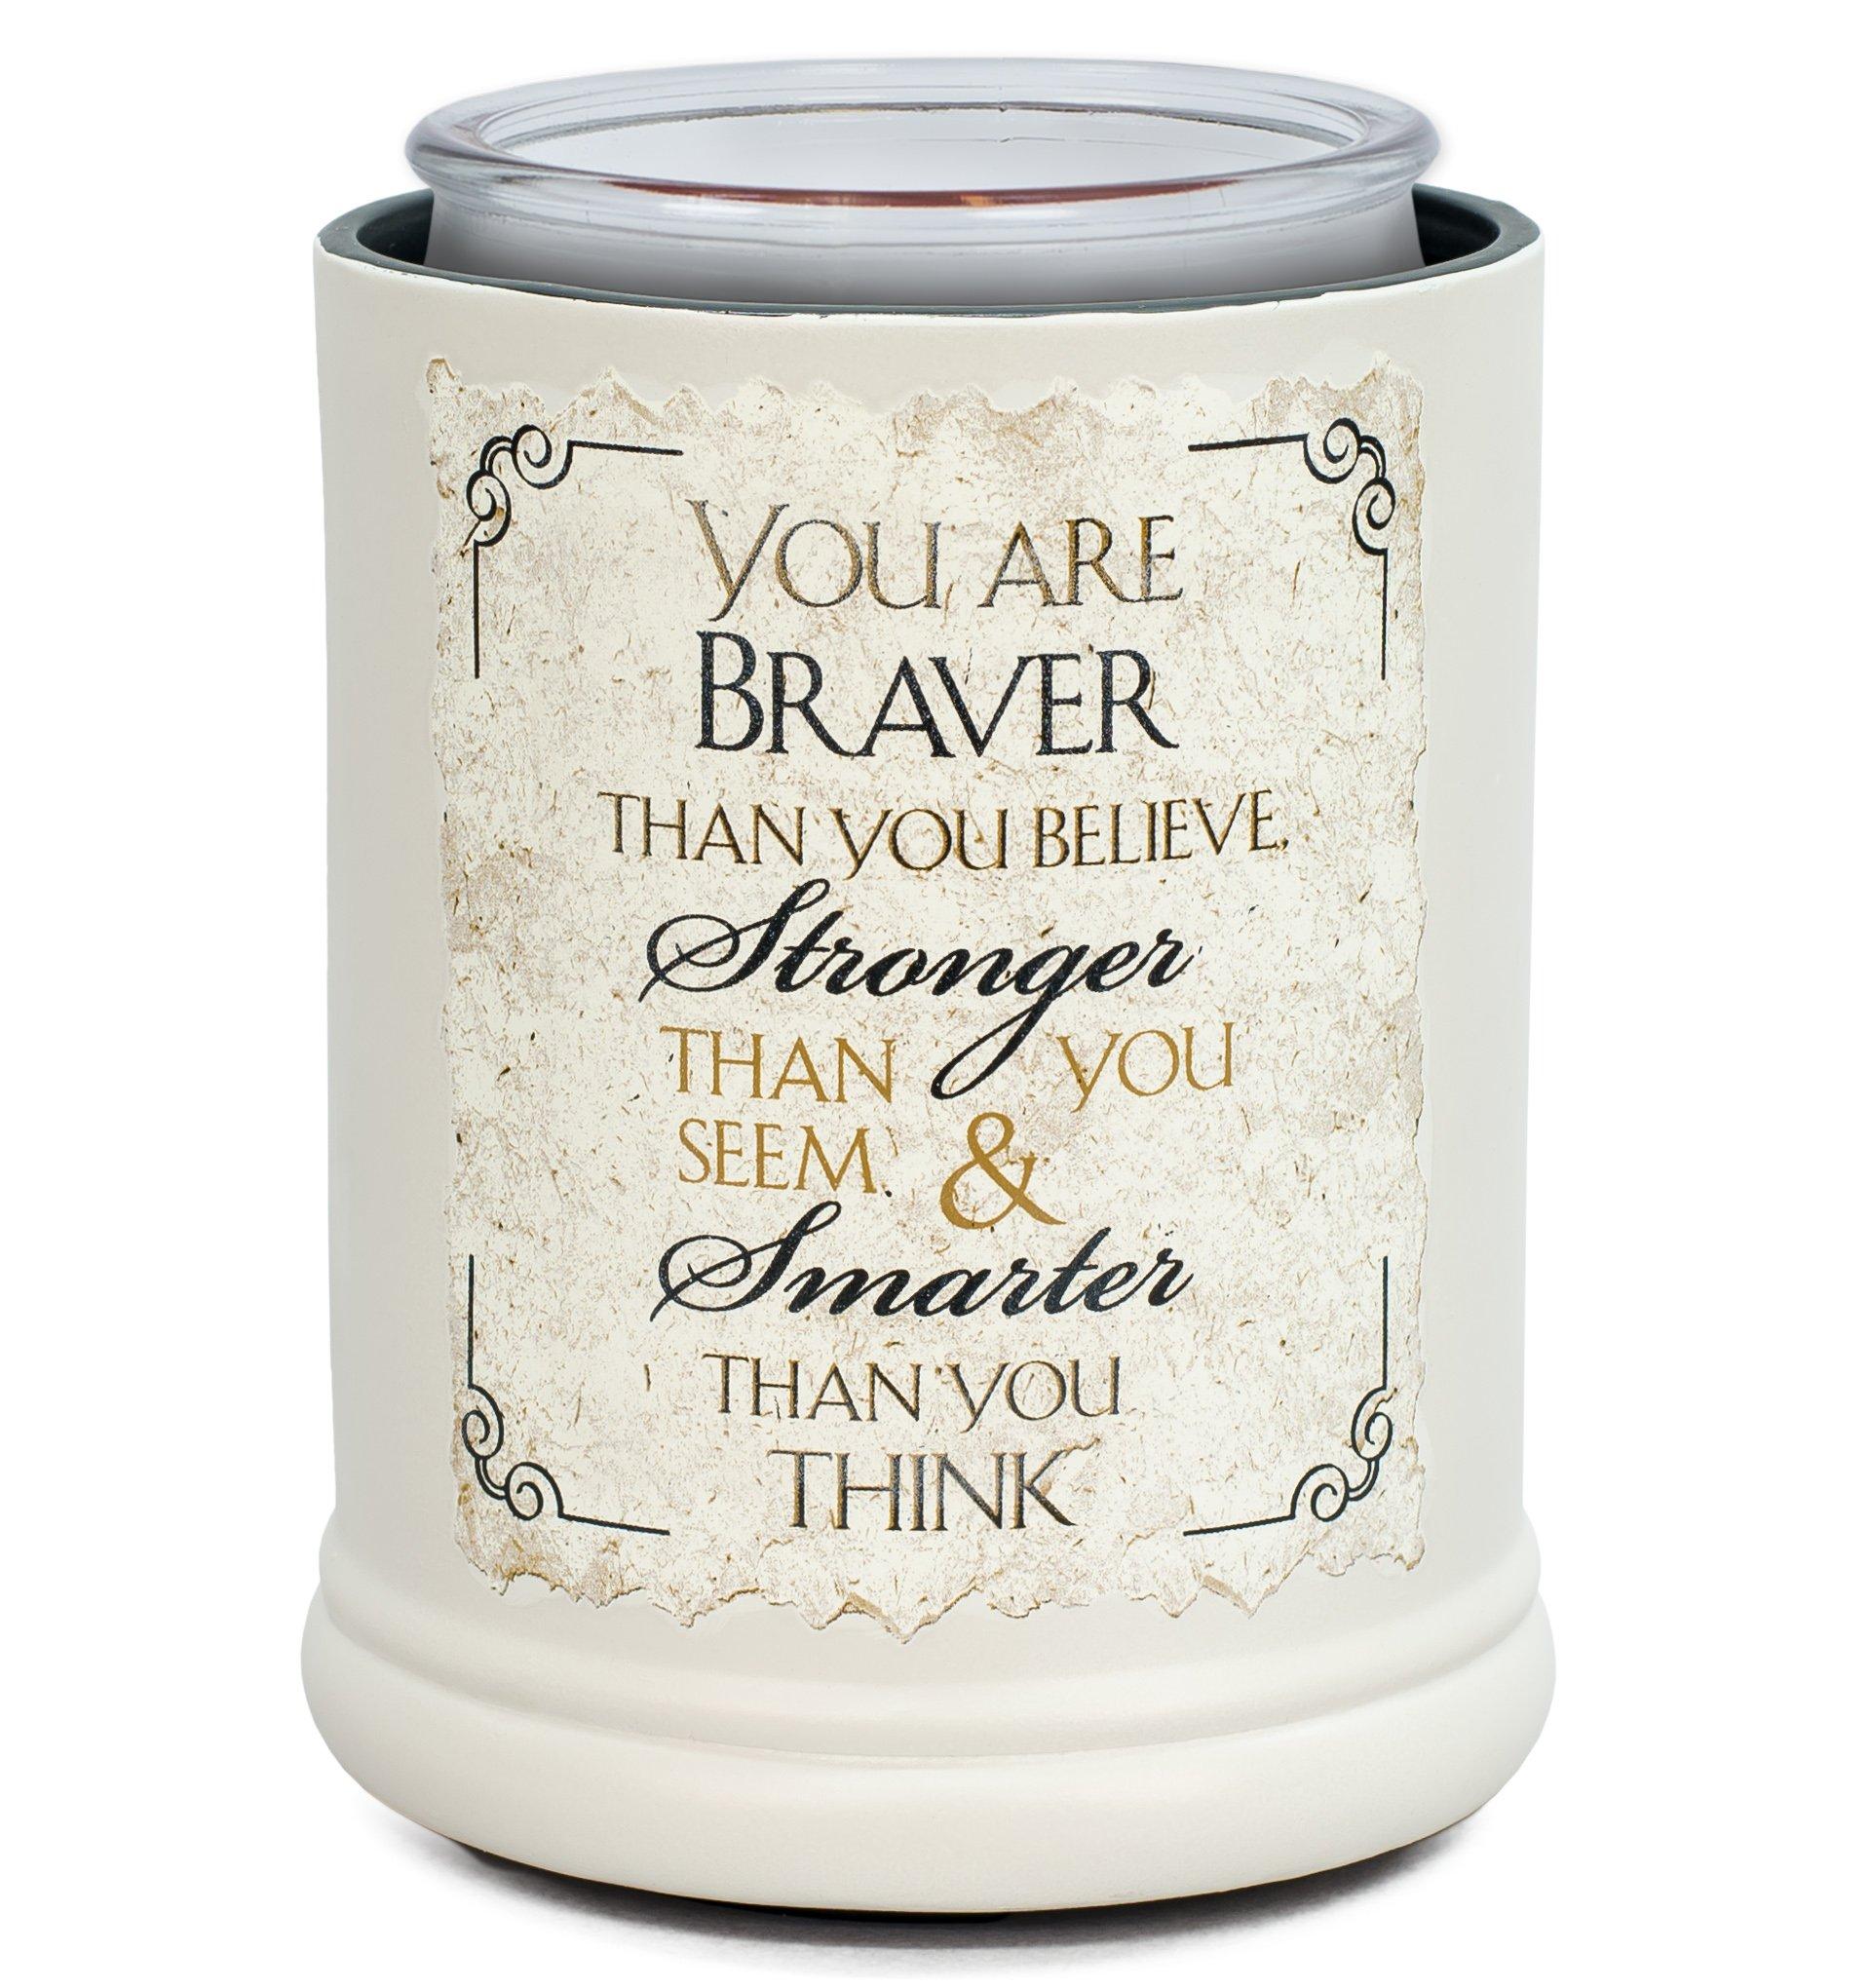 Elanze Designs You are Braver Stronger Smarter Ceramic Stoneware Electric Jar Candle Warmer by Elanze Designs (Image #3)